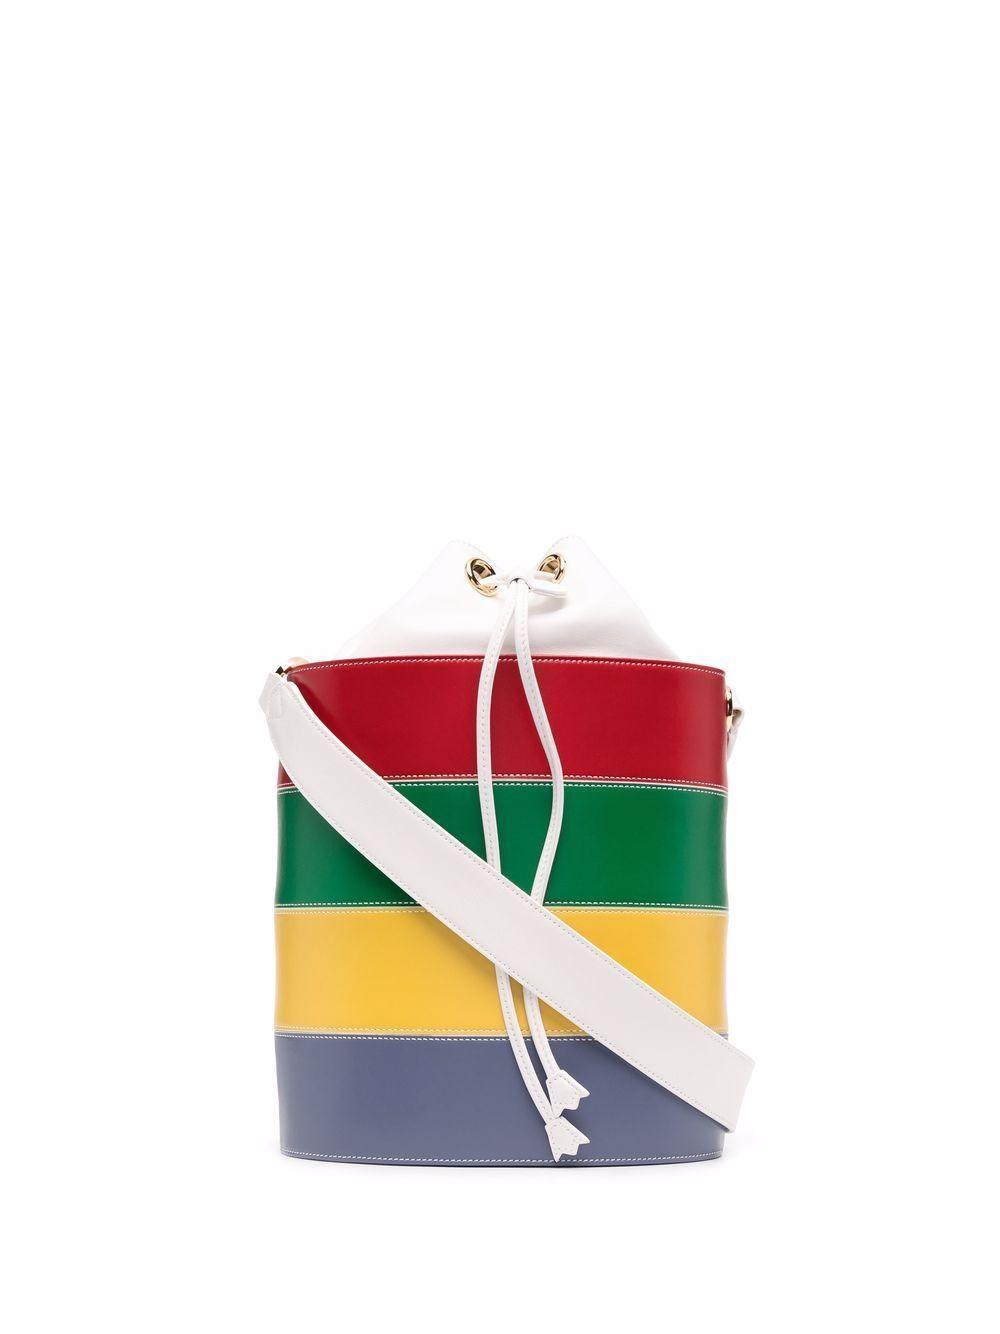 Basket leather handbag